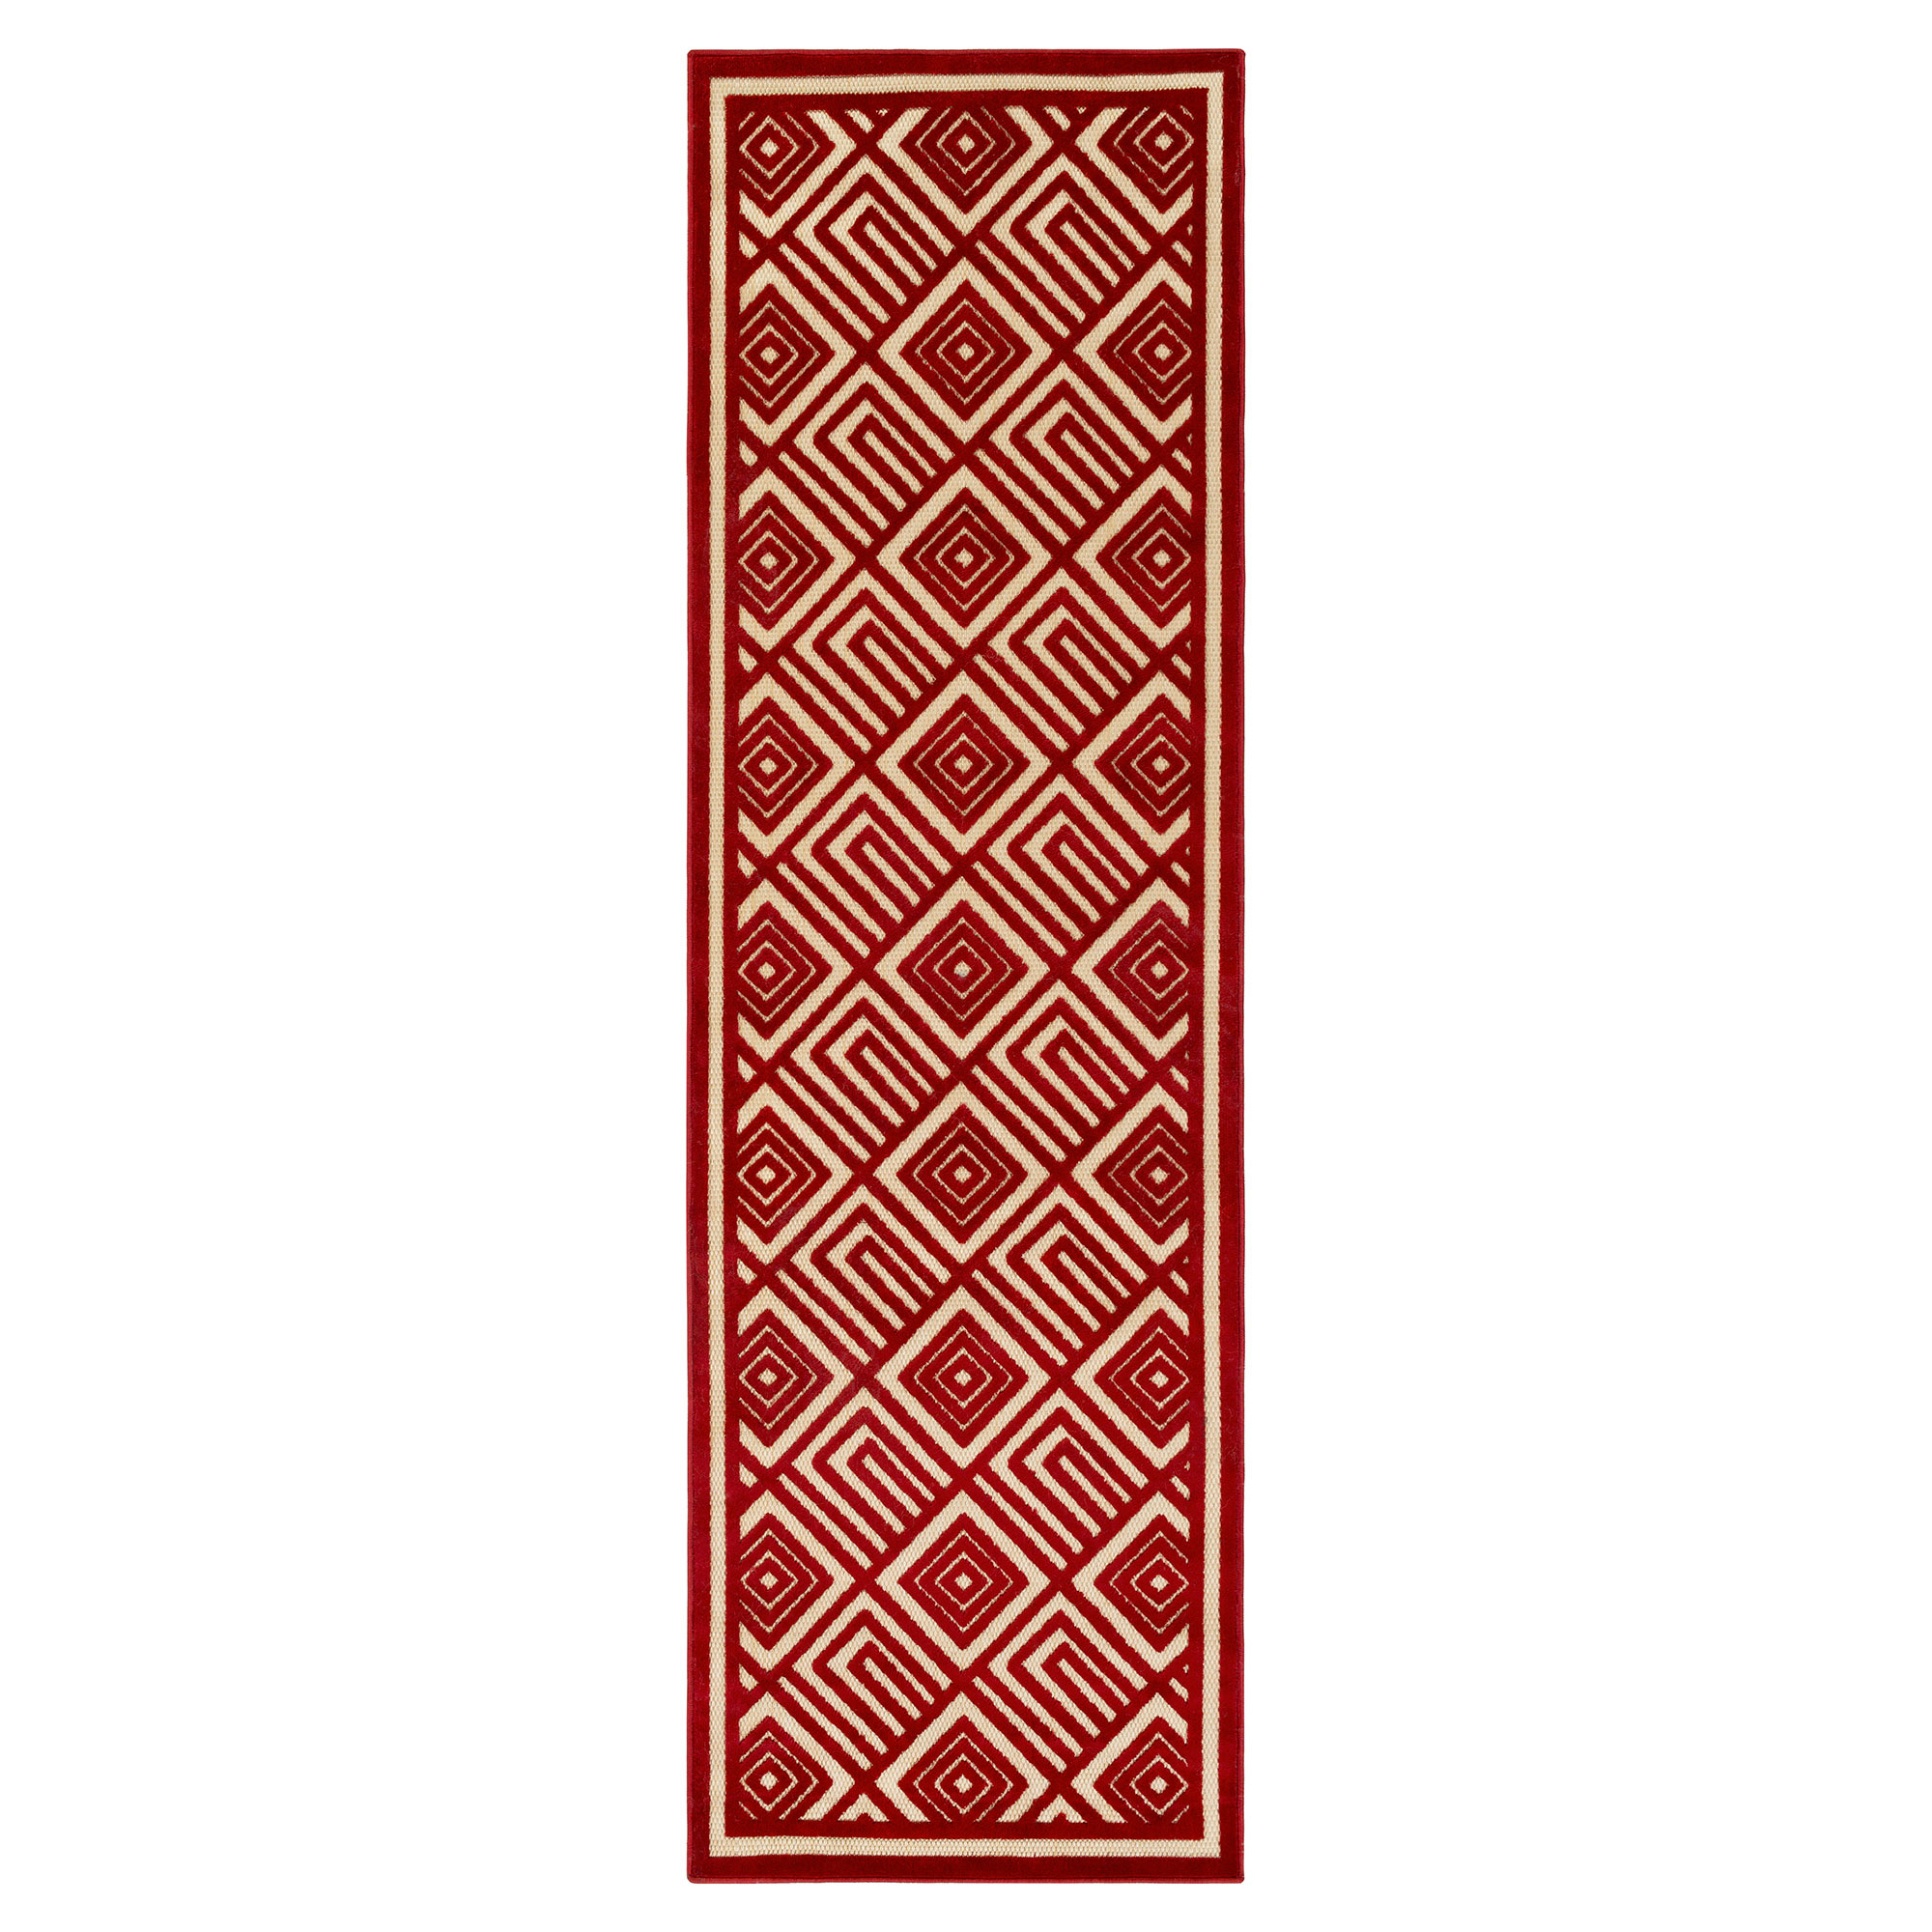 Anouk Global Dark Red Geometric Outdoor Rug - 2'6x7'10